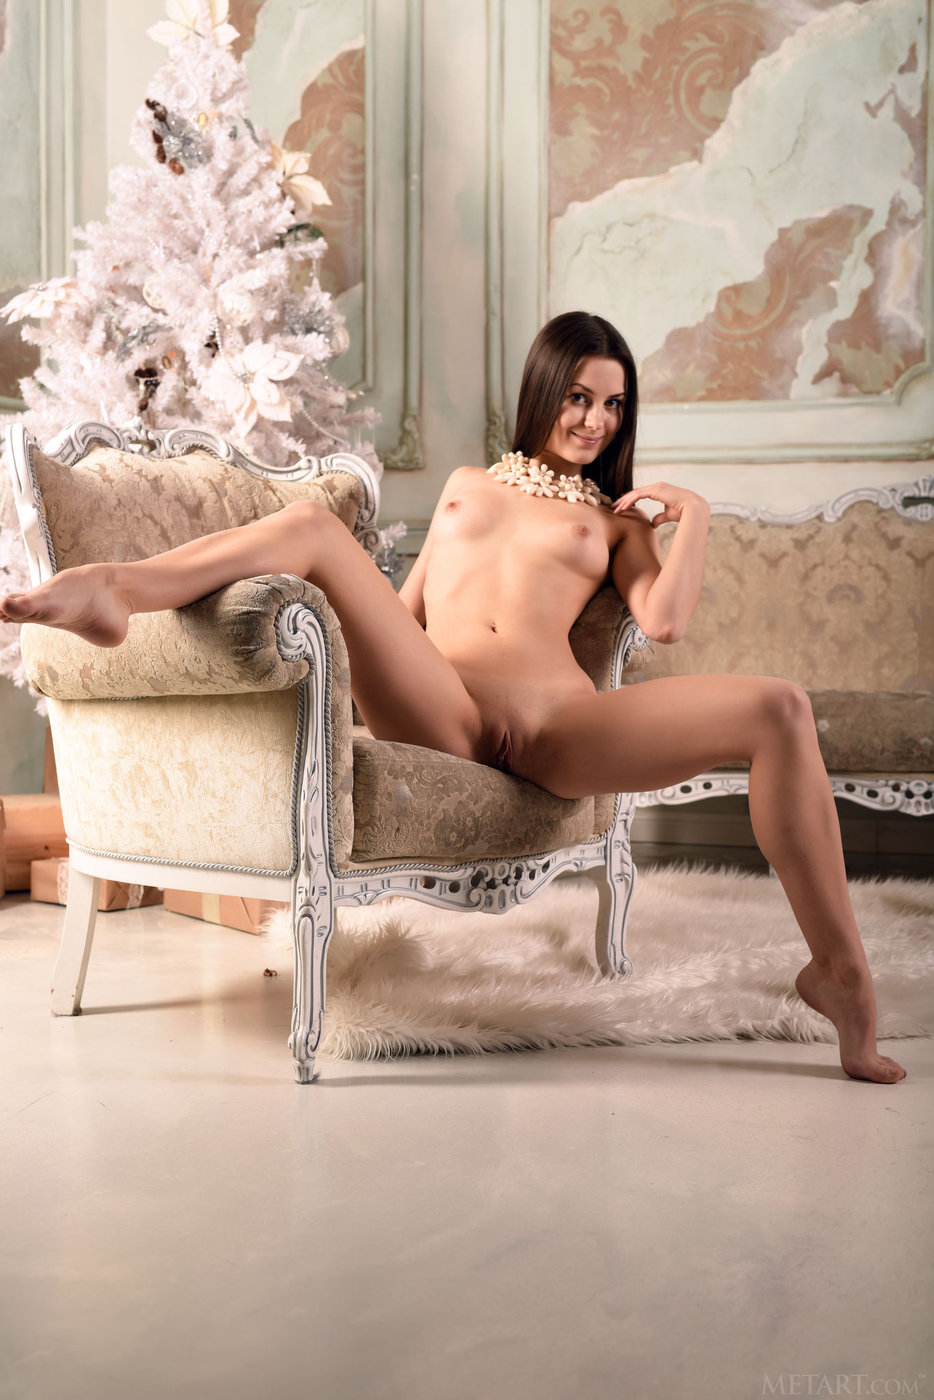 Porn beautiful woman turke